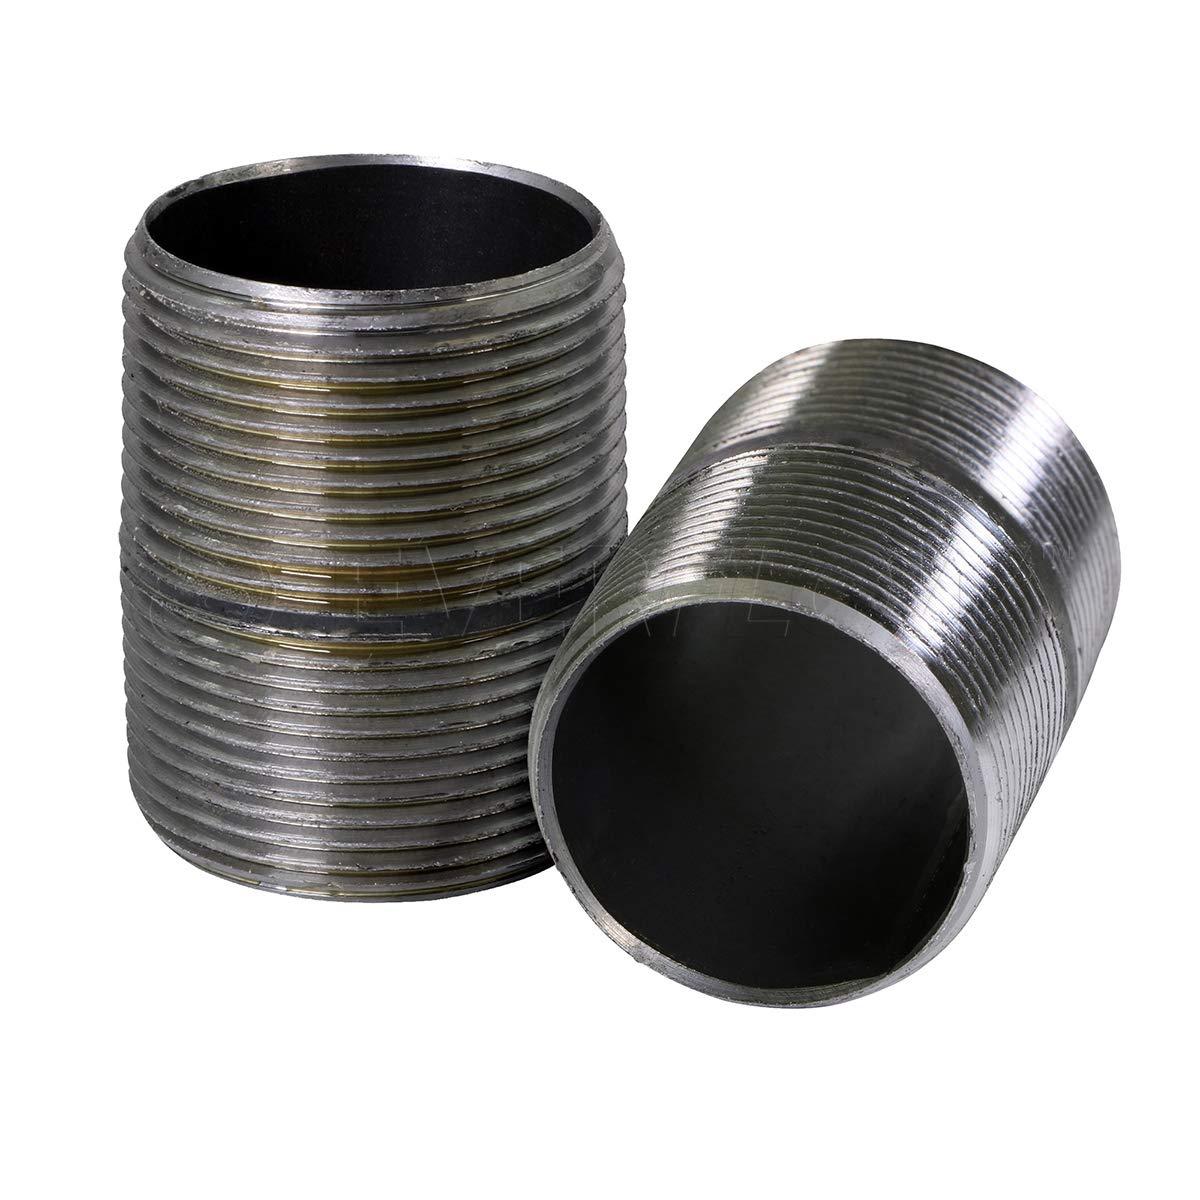 LASCO 17-9673 1//4-Inch Female Pipe Thread Galvanized Merchant Coupling